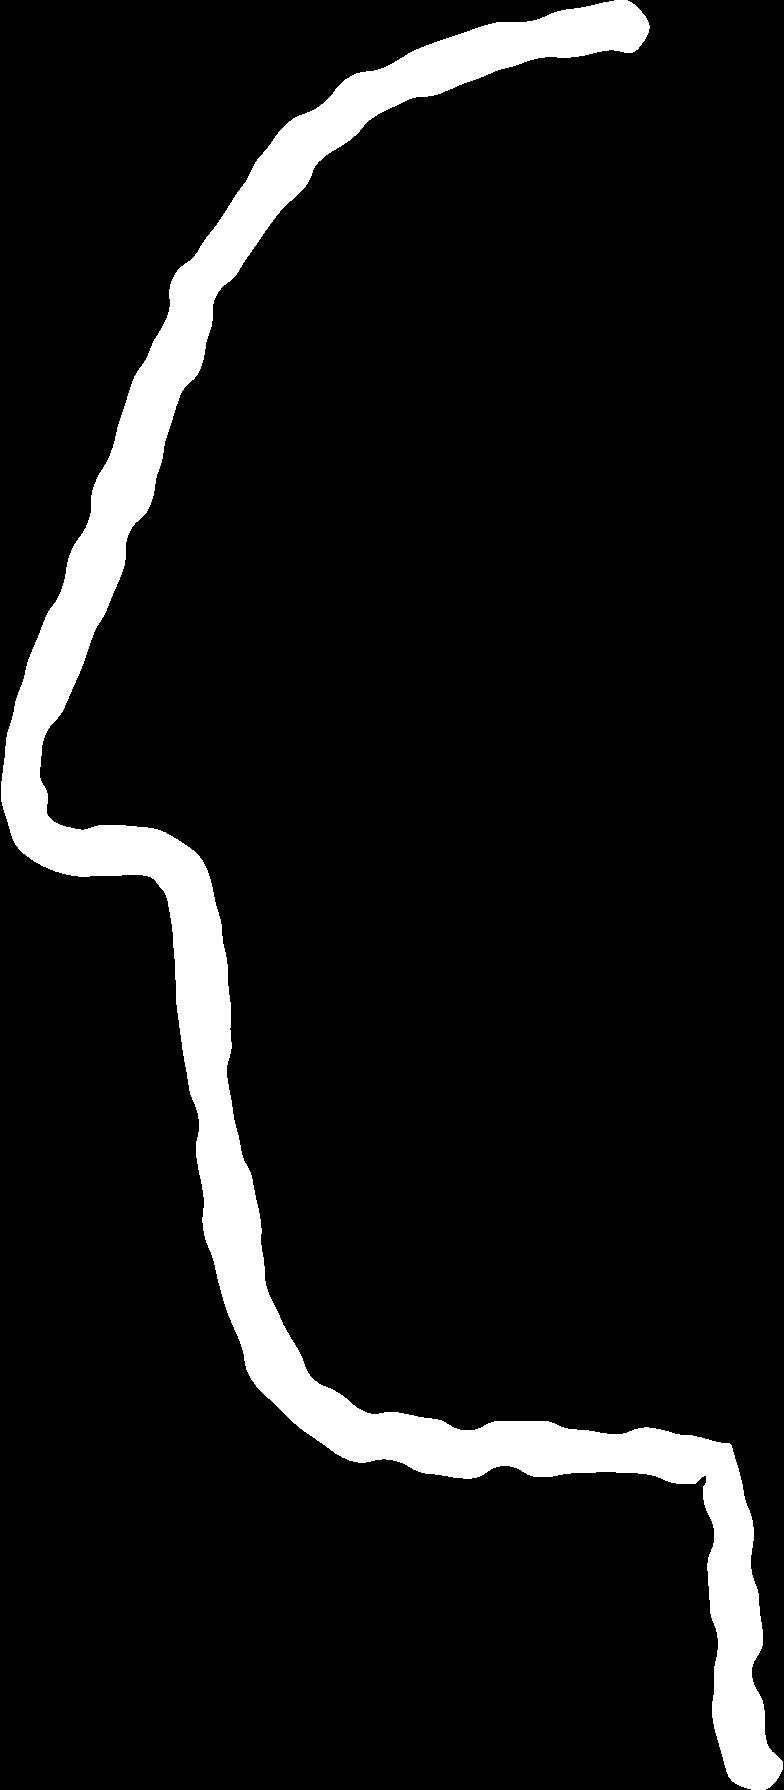 shape man white Clipart illustration in PNG, SVG